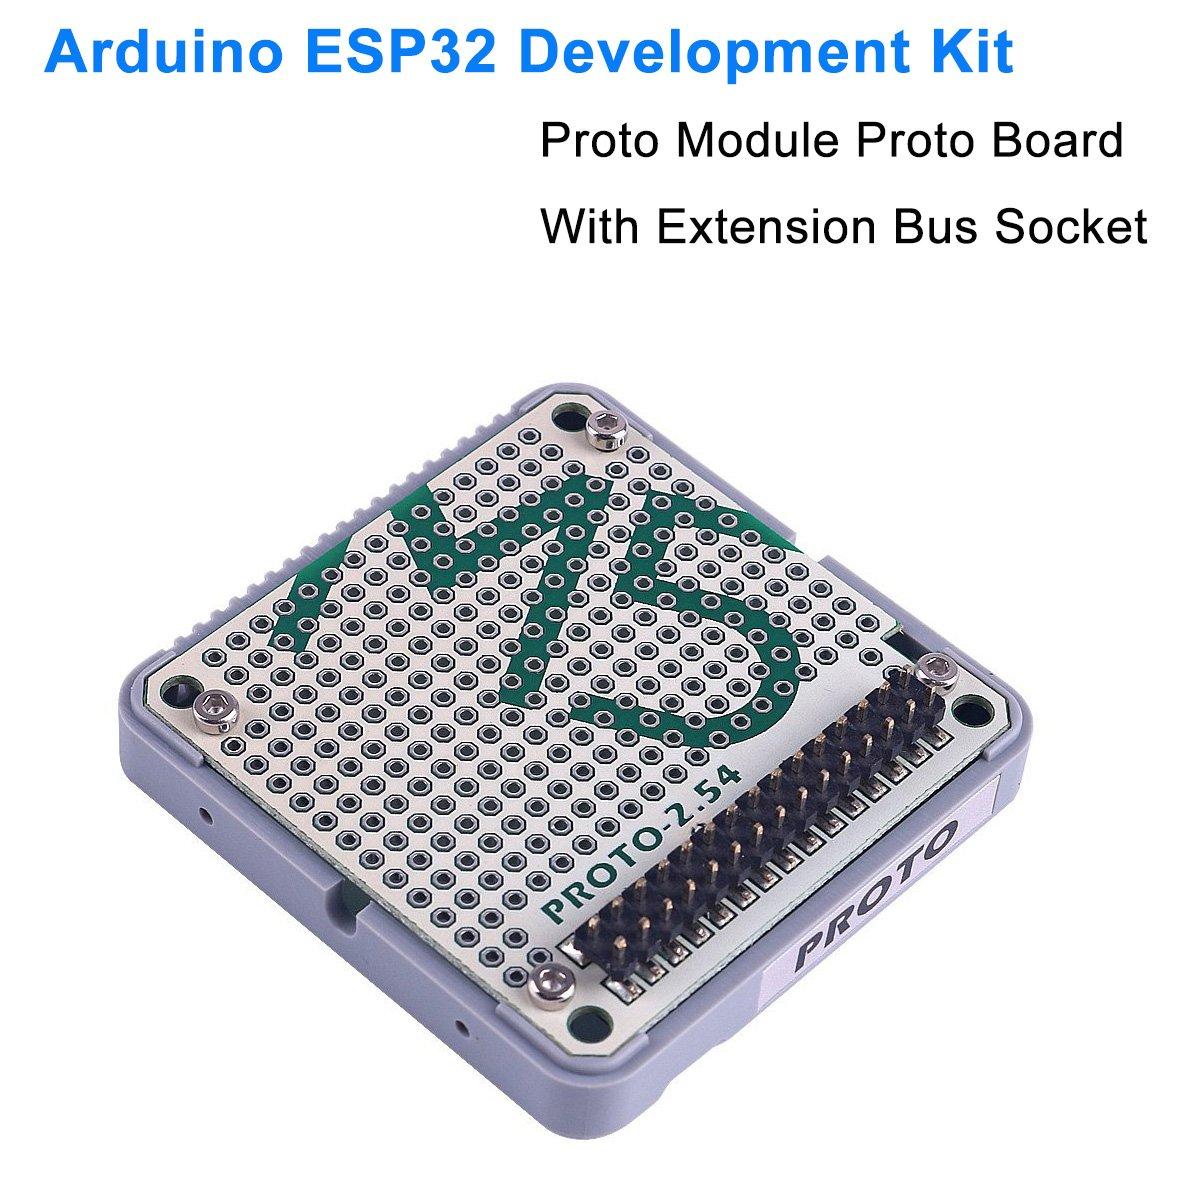 MakerHawk ESP32 Development Board Official Stock Offer Proto Module Proto  Board with Extension Bus Socket for Arduino ESP32 Development Kit M5Stack